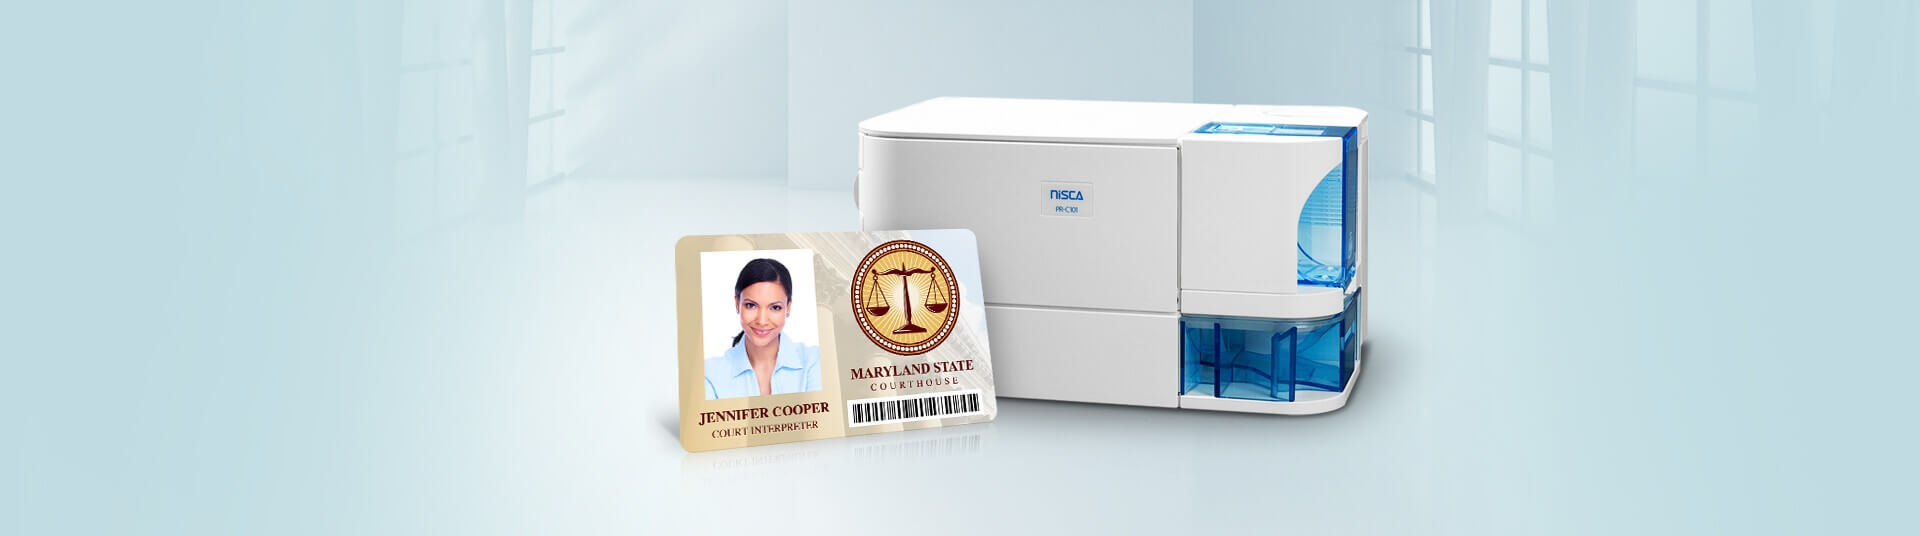 Nisca PR-C101 Printers